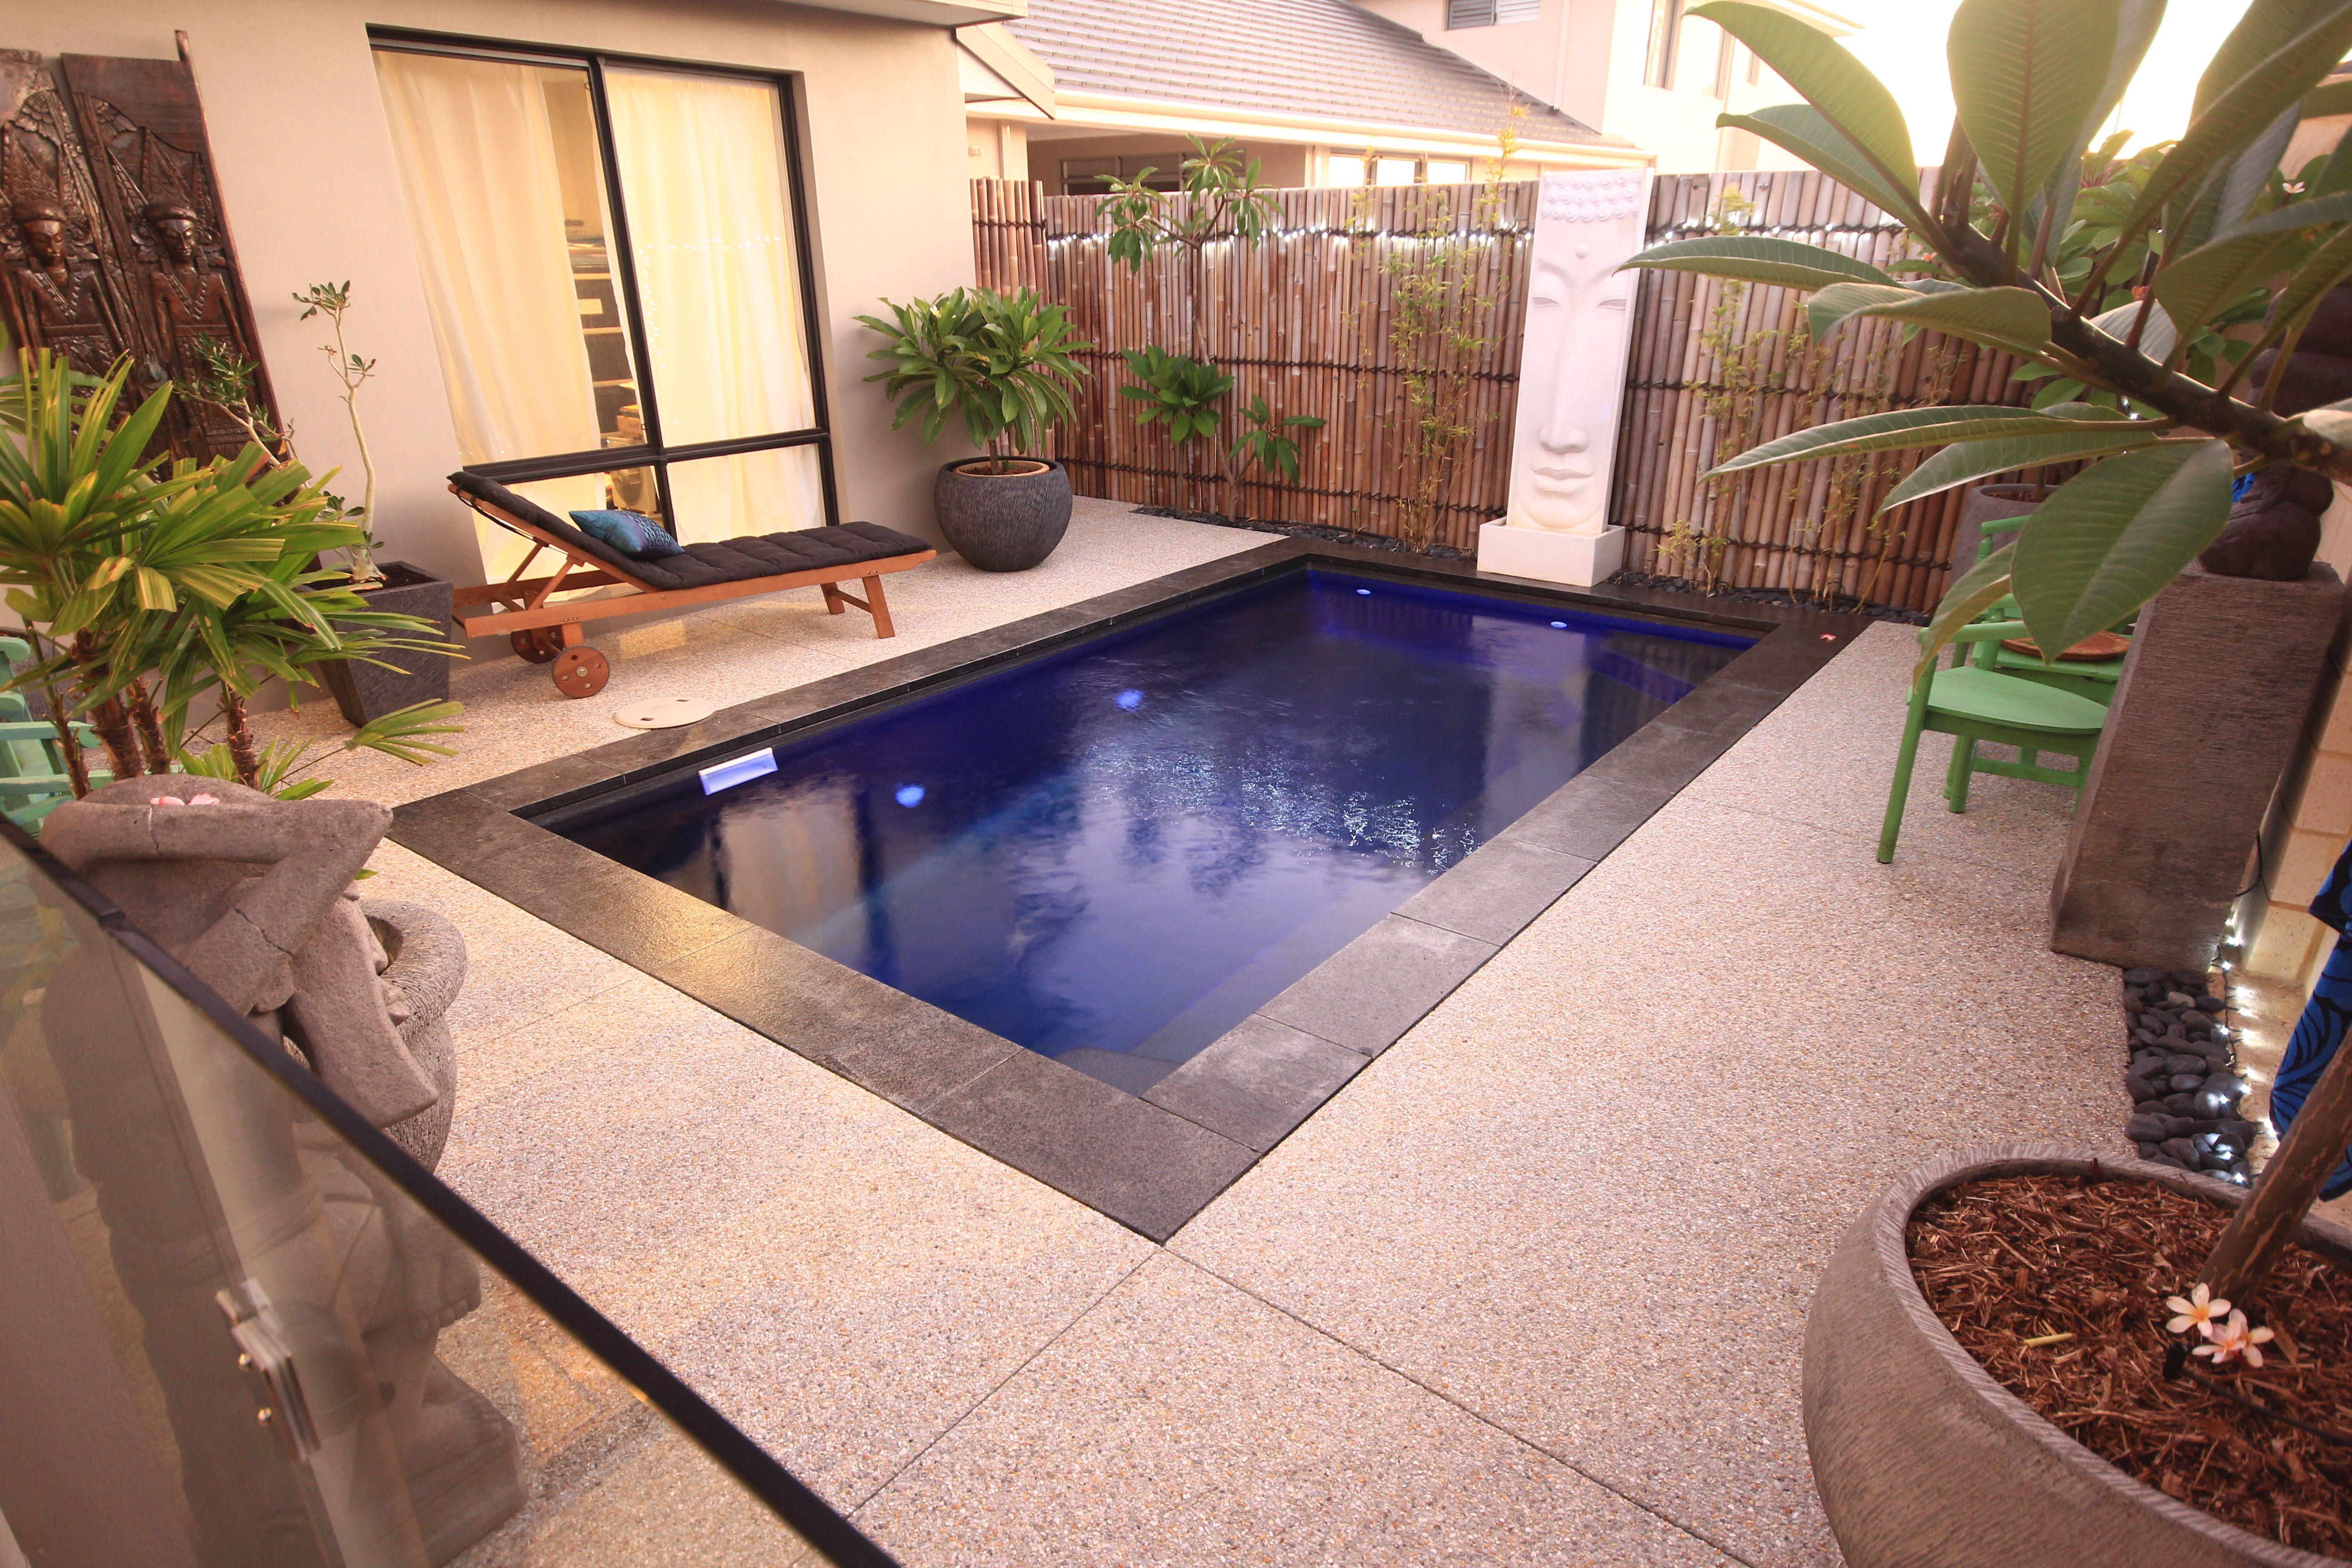 Verona 4.5m x 2.5m Swimming pools, Small pools, Verona